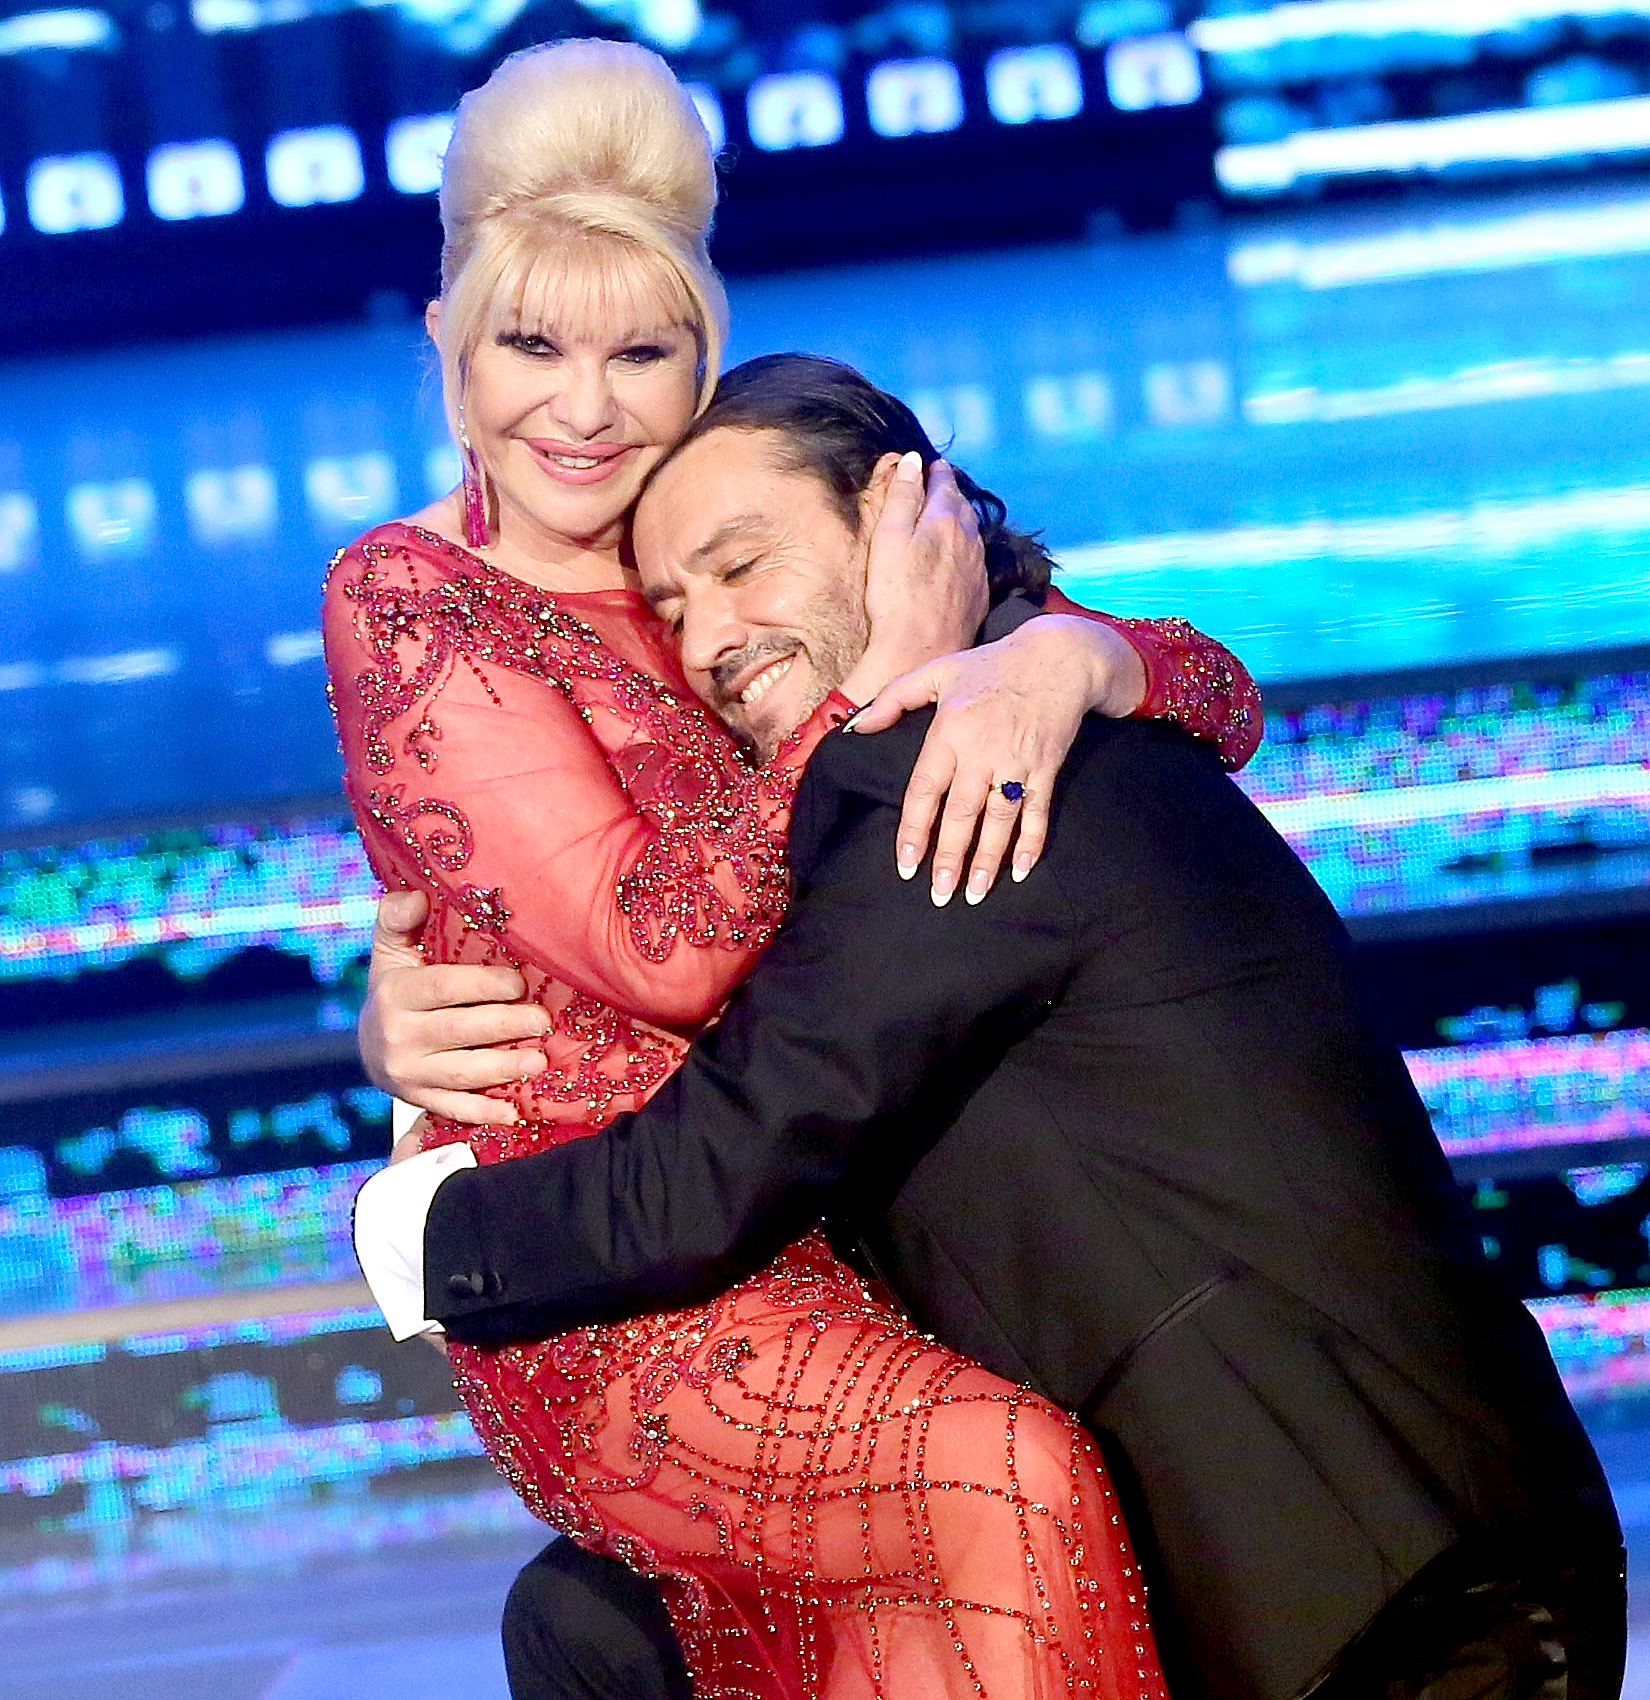 Ivana-Trump-and-Rossano-Rubicondi-Split-Again